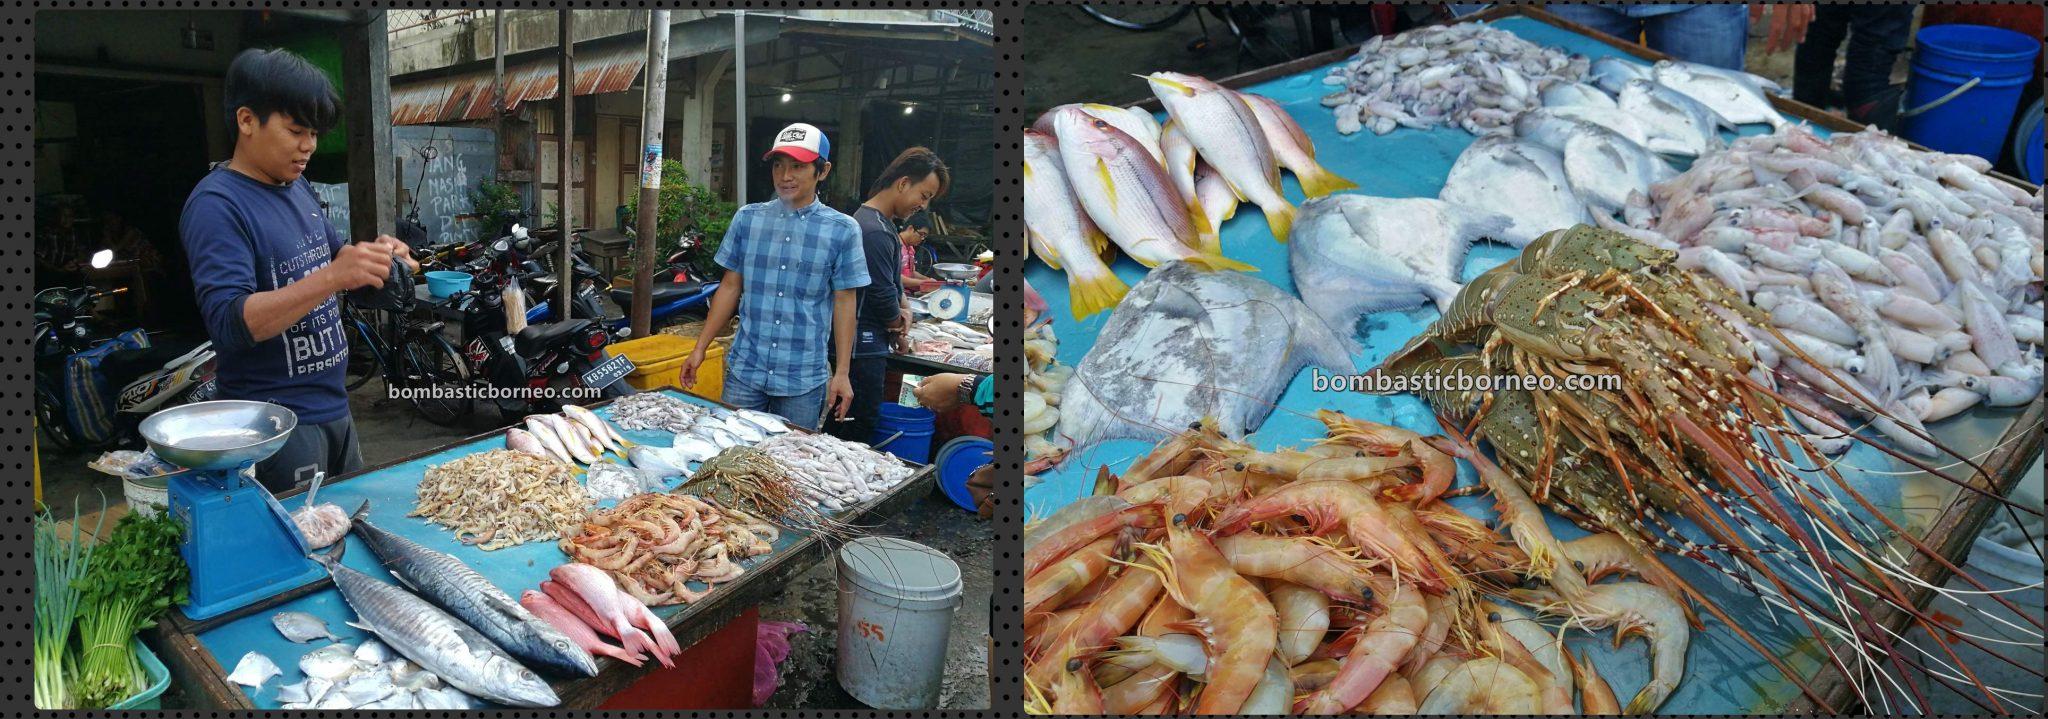 Pasar Turi, Morning Market, traditional, Kalimantan Barat, seafood, fish, lobster, Tourism, tourist attraction, travel guide, Trans Border, Borneo, 跨境婆罗洲游踪, 印尼西加里曼丹, 山口洋早市